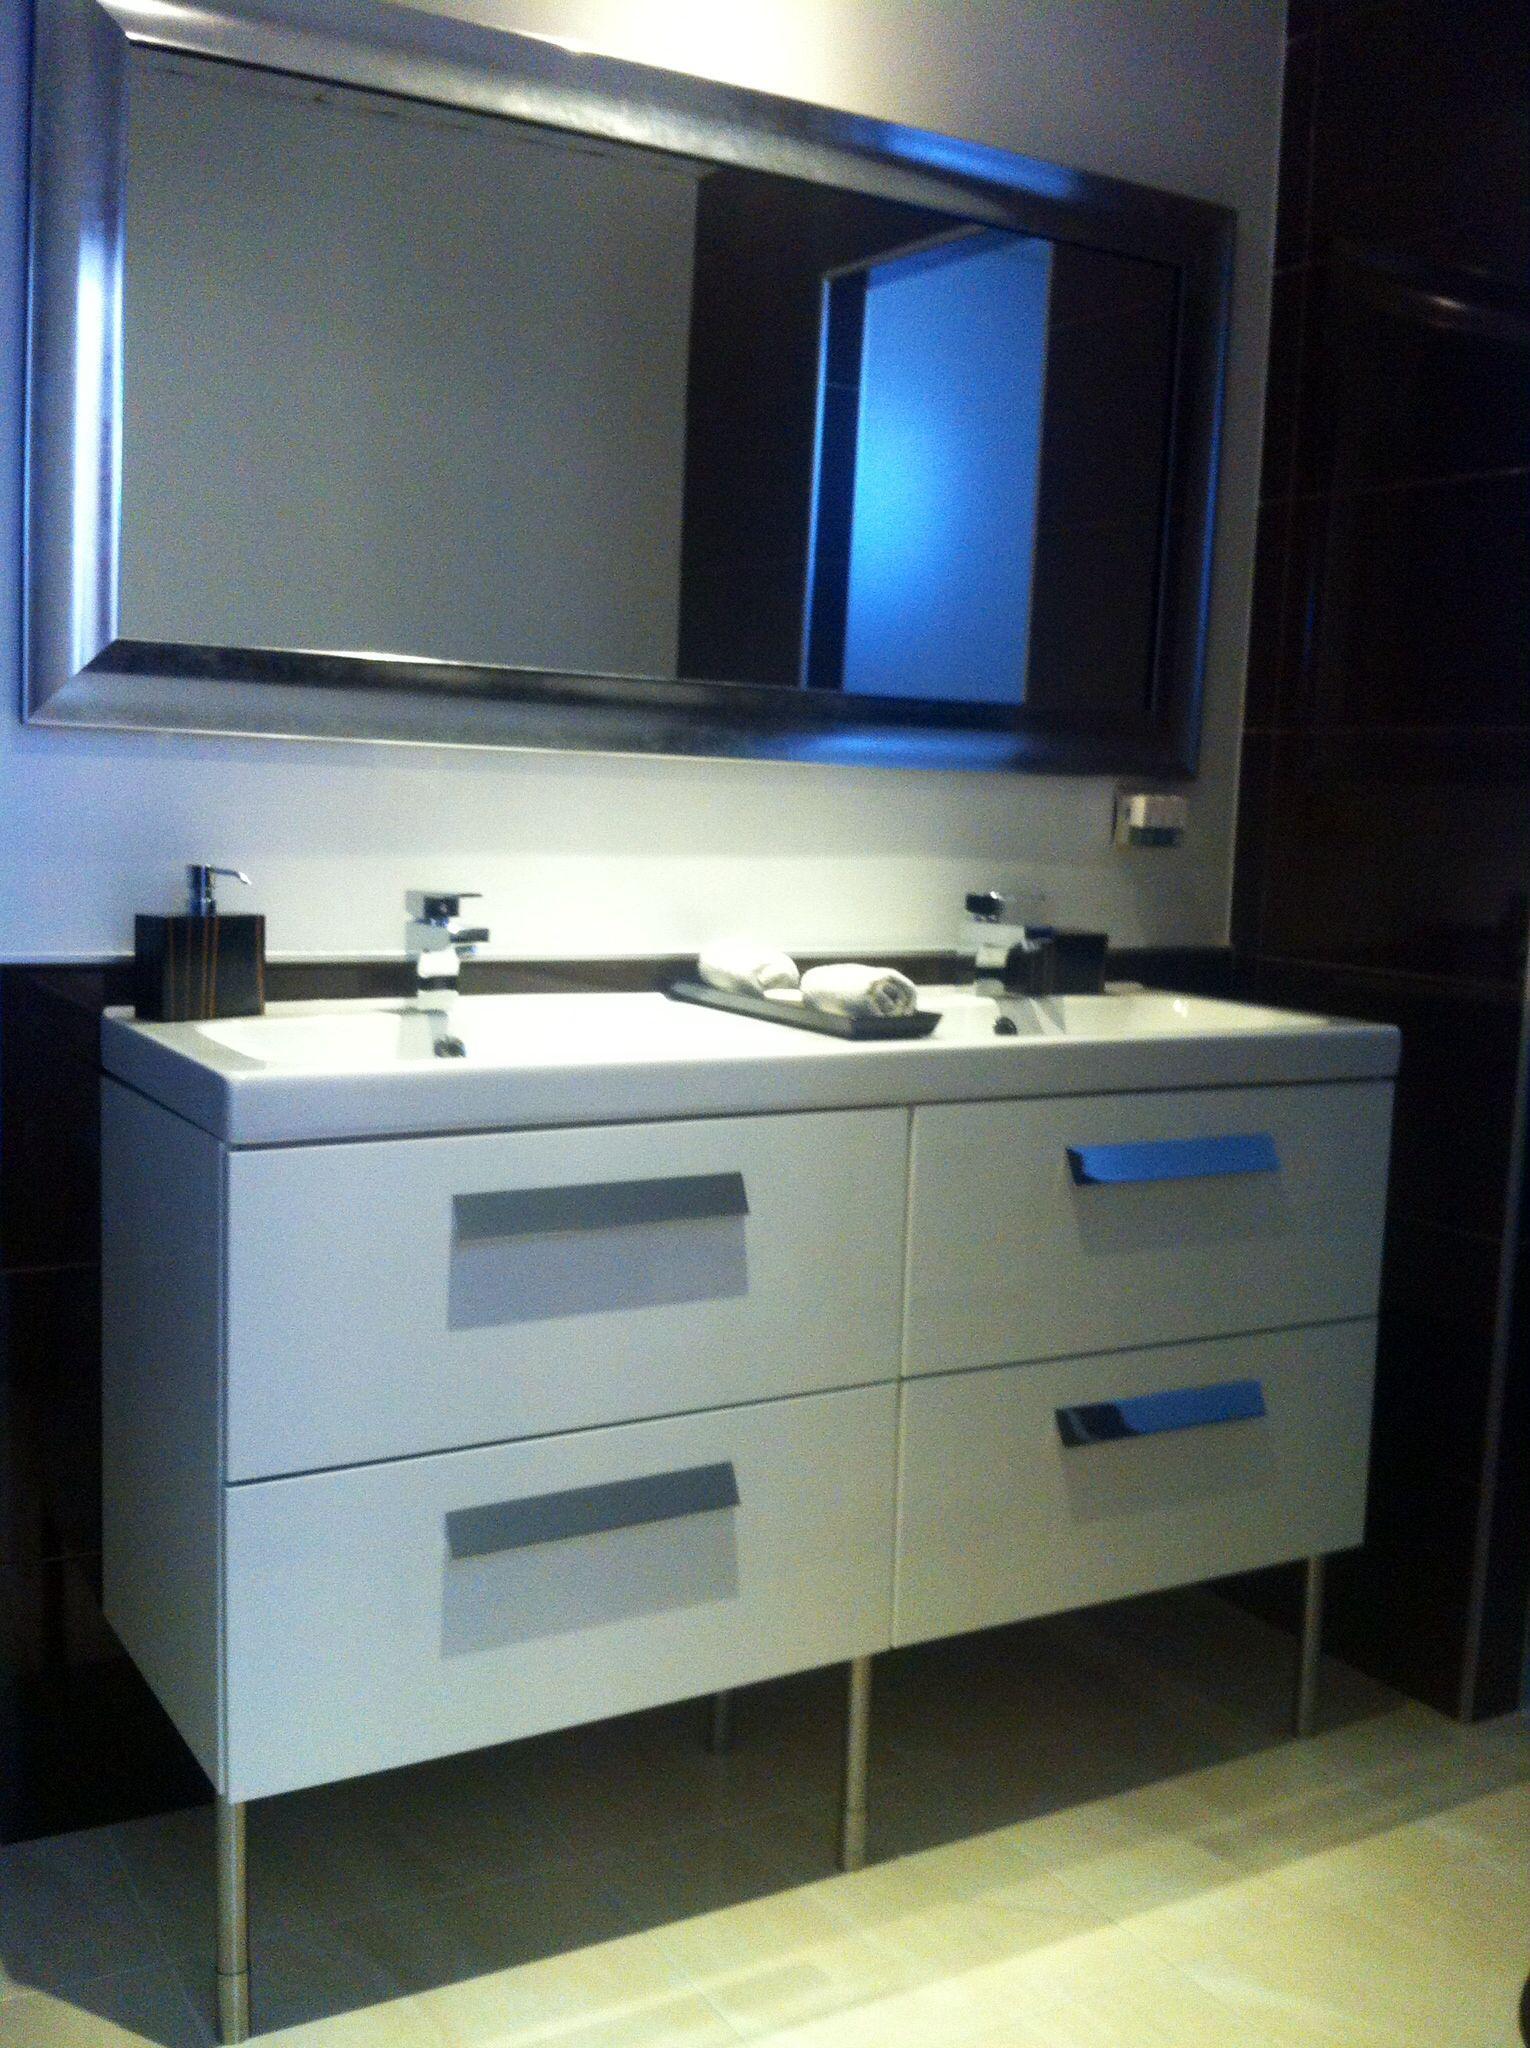 Ikea Godmorgon bath room cuarto de baño | Ikea ideas | Pinterest ...